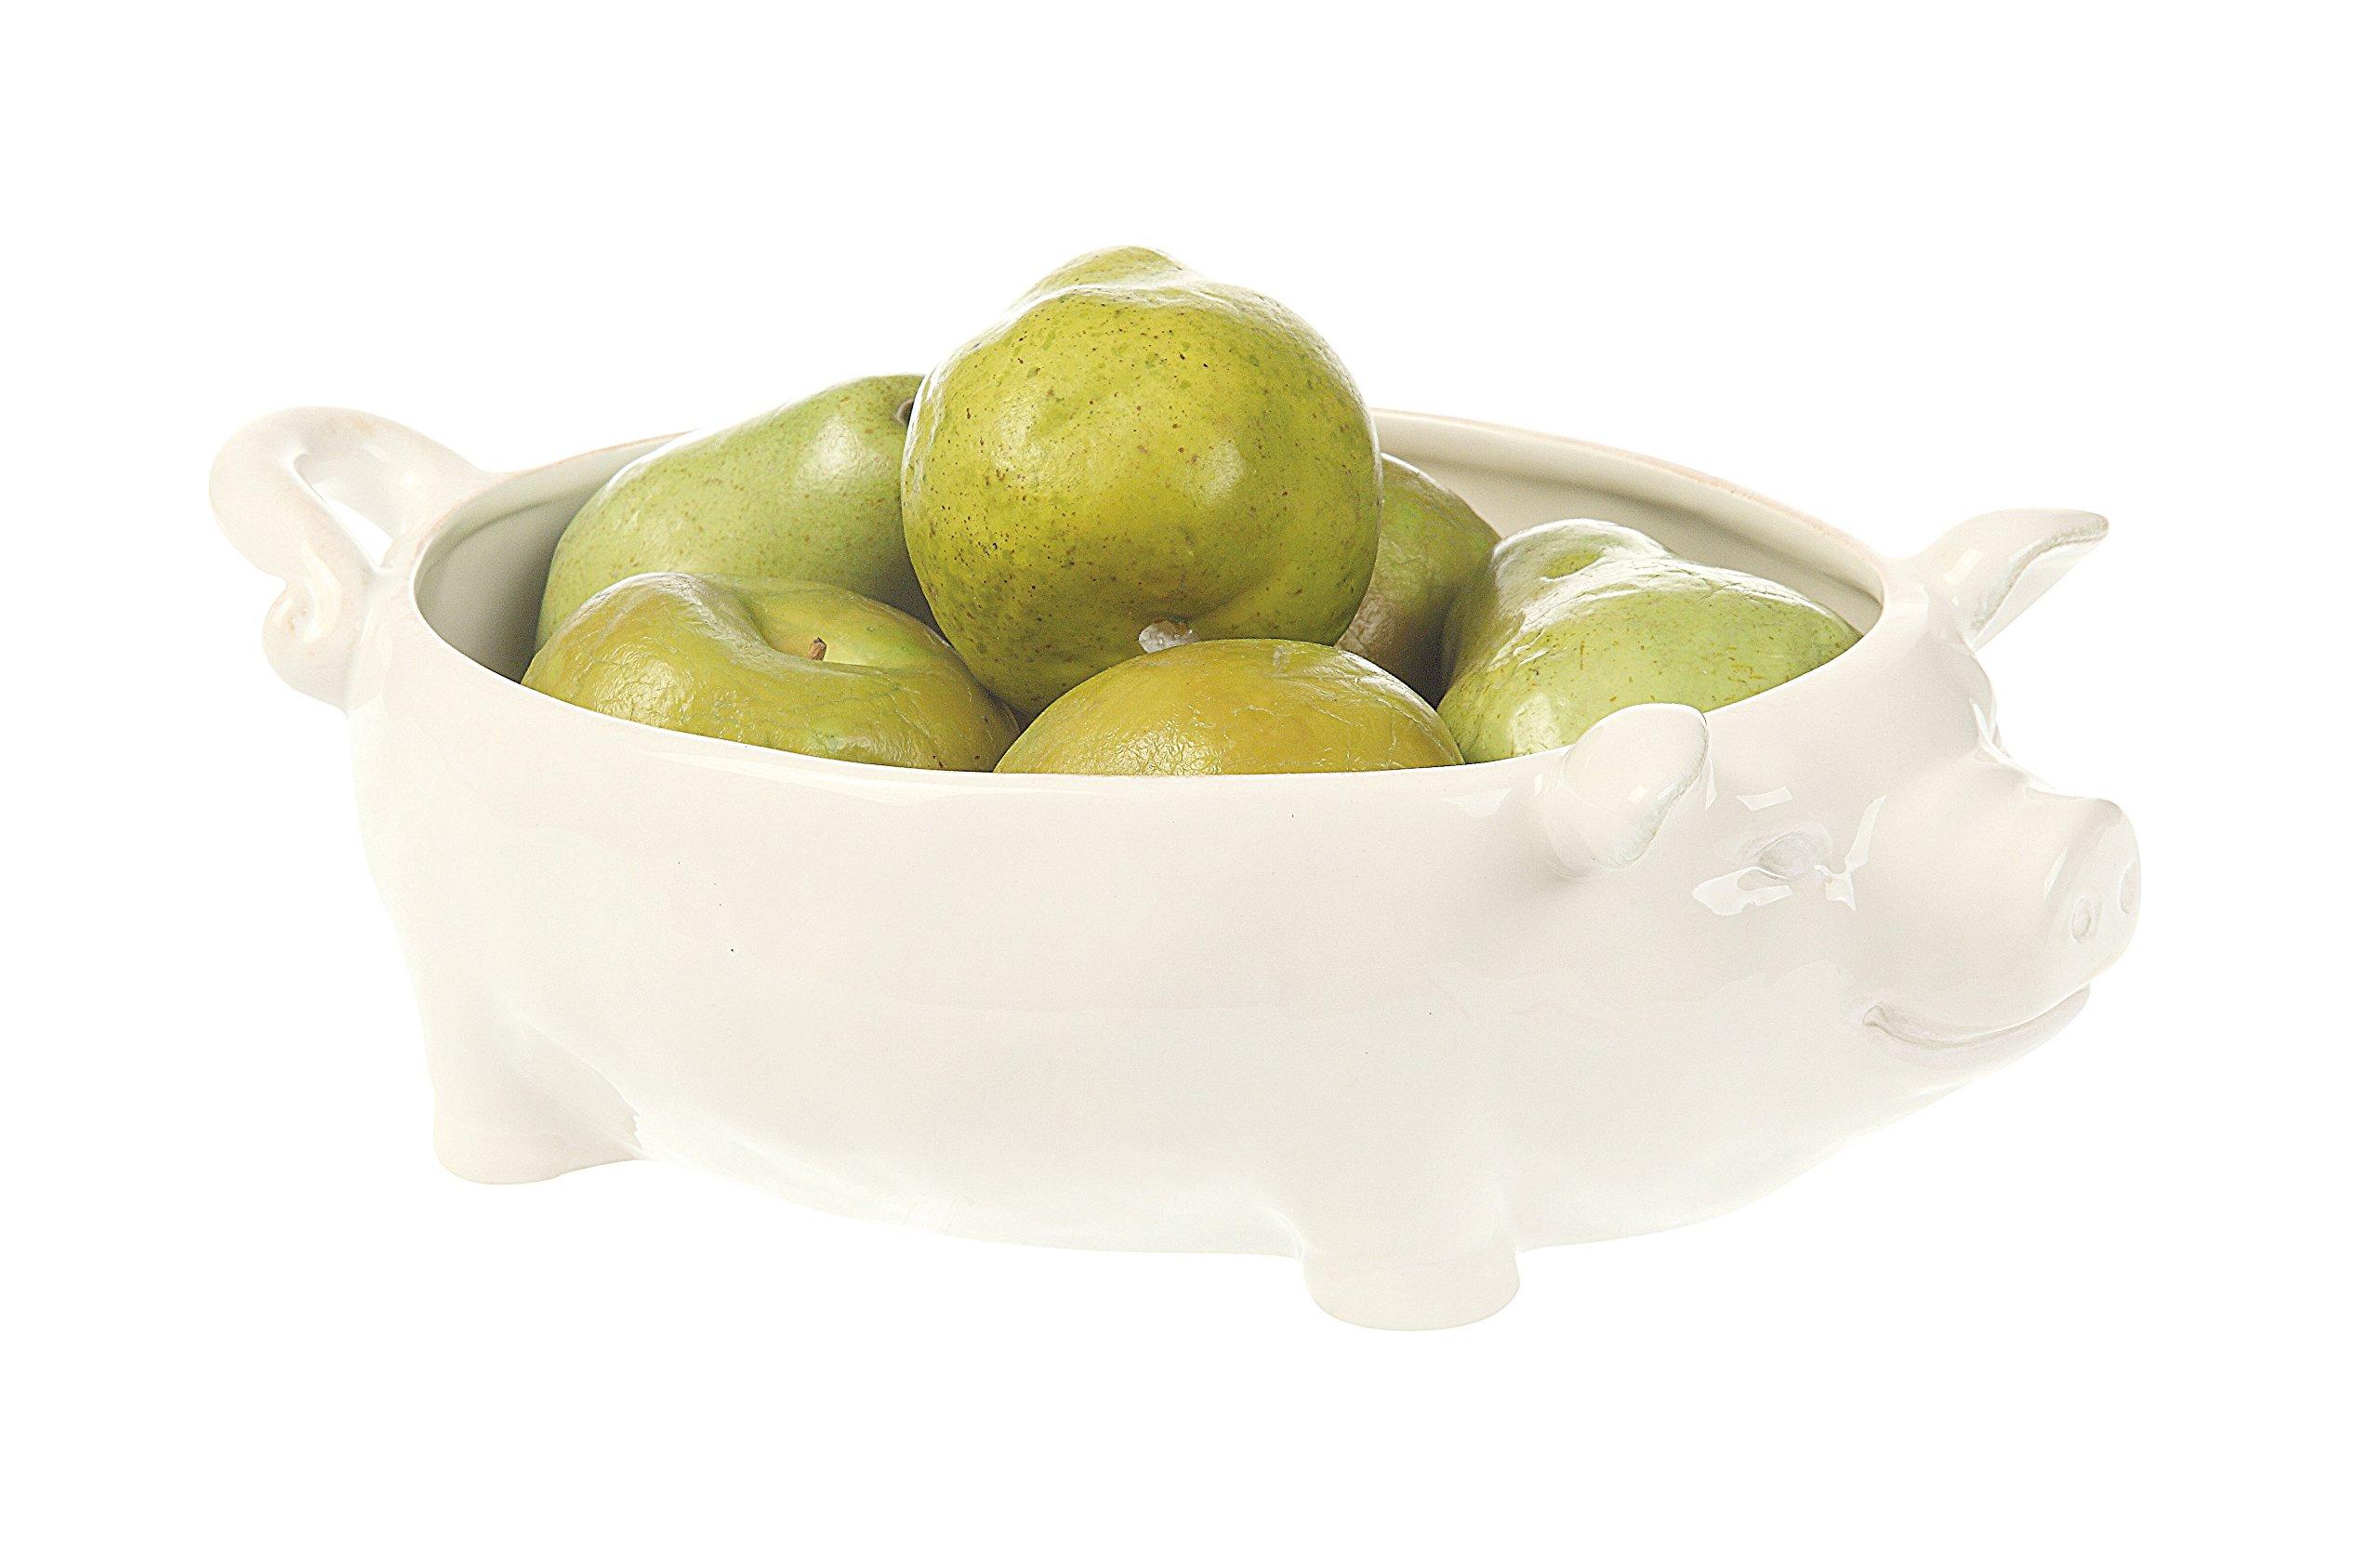 Creative Co-op DA1000 White Ceramic Pig Shaped Bowl